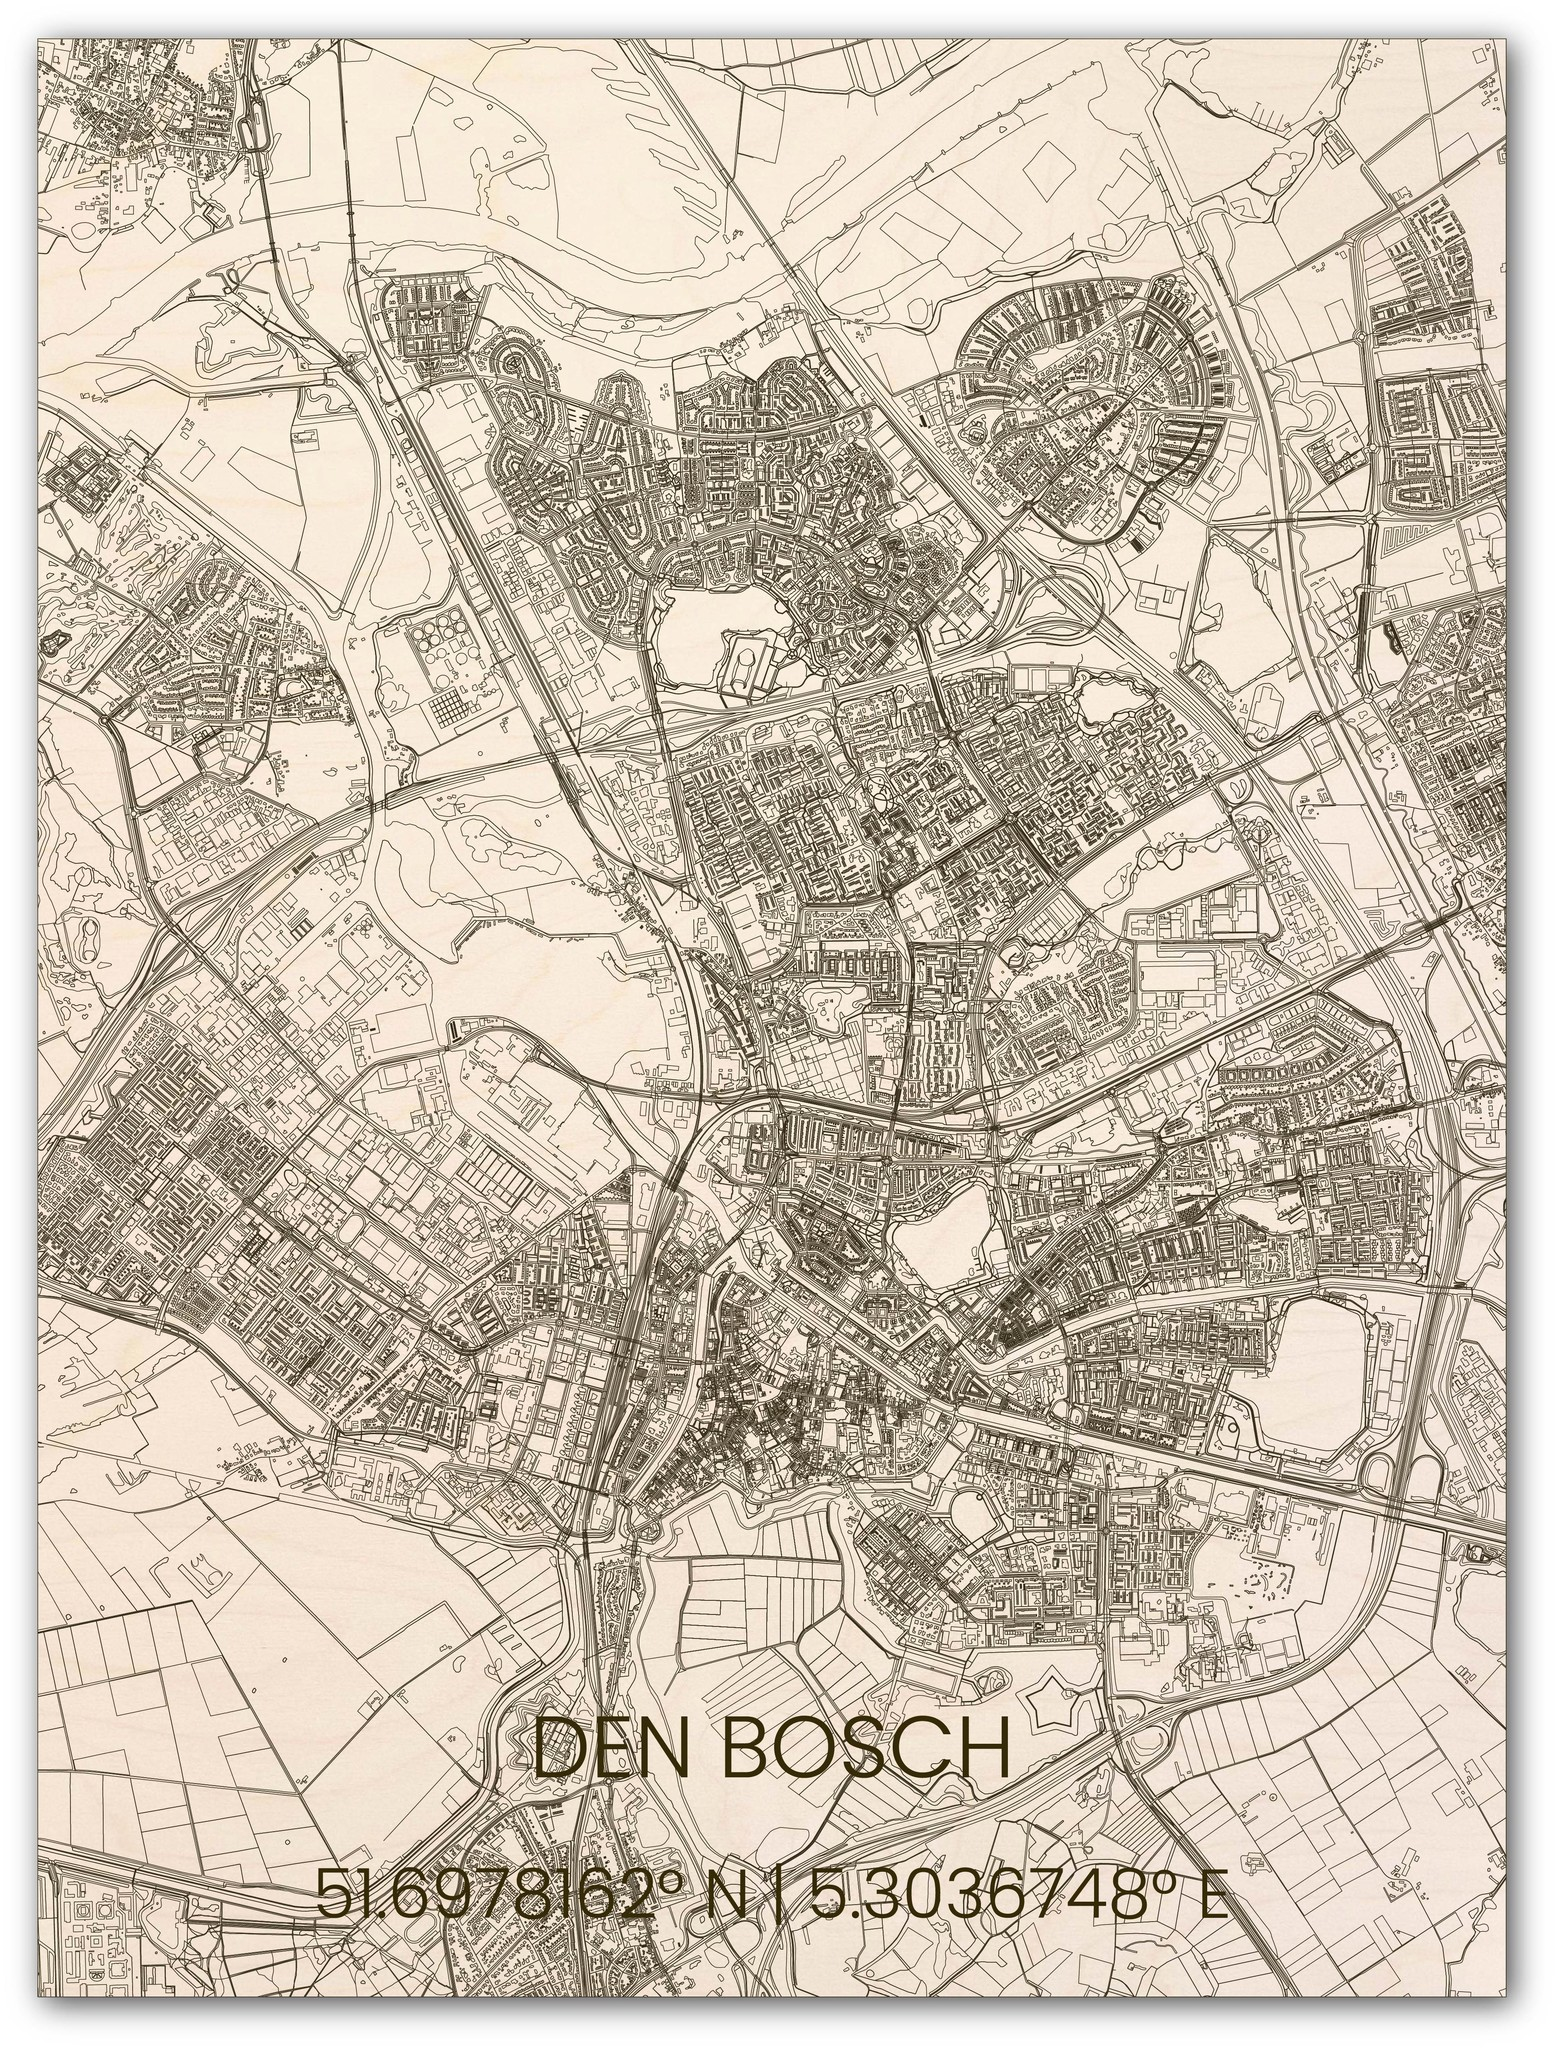 Houten stadsplattegrond Den Bosch-1